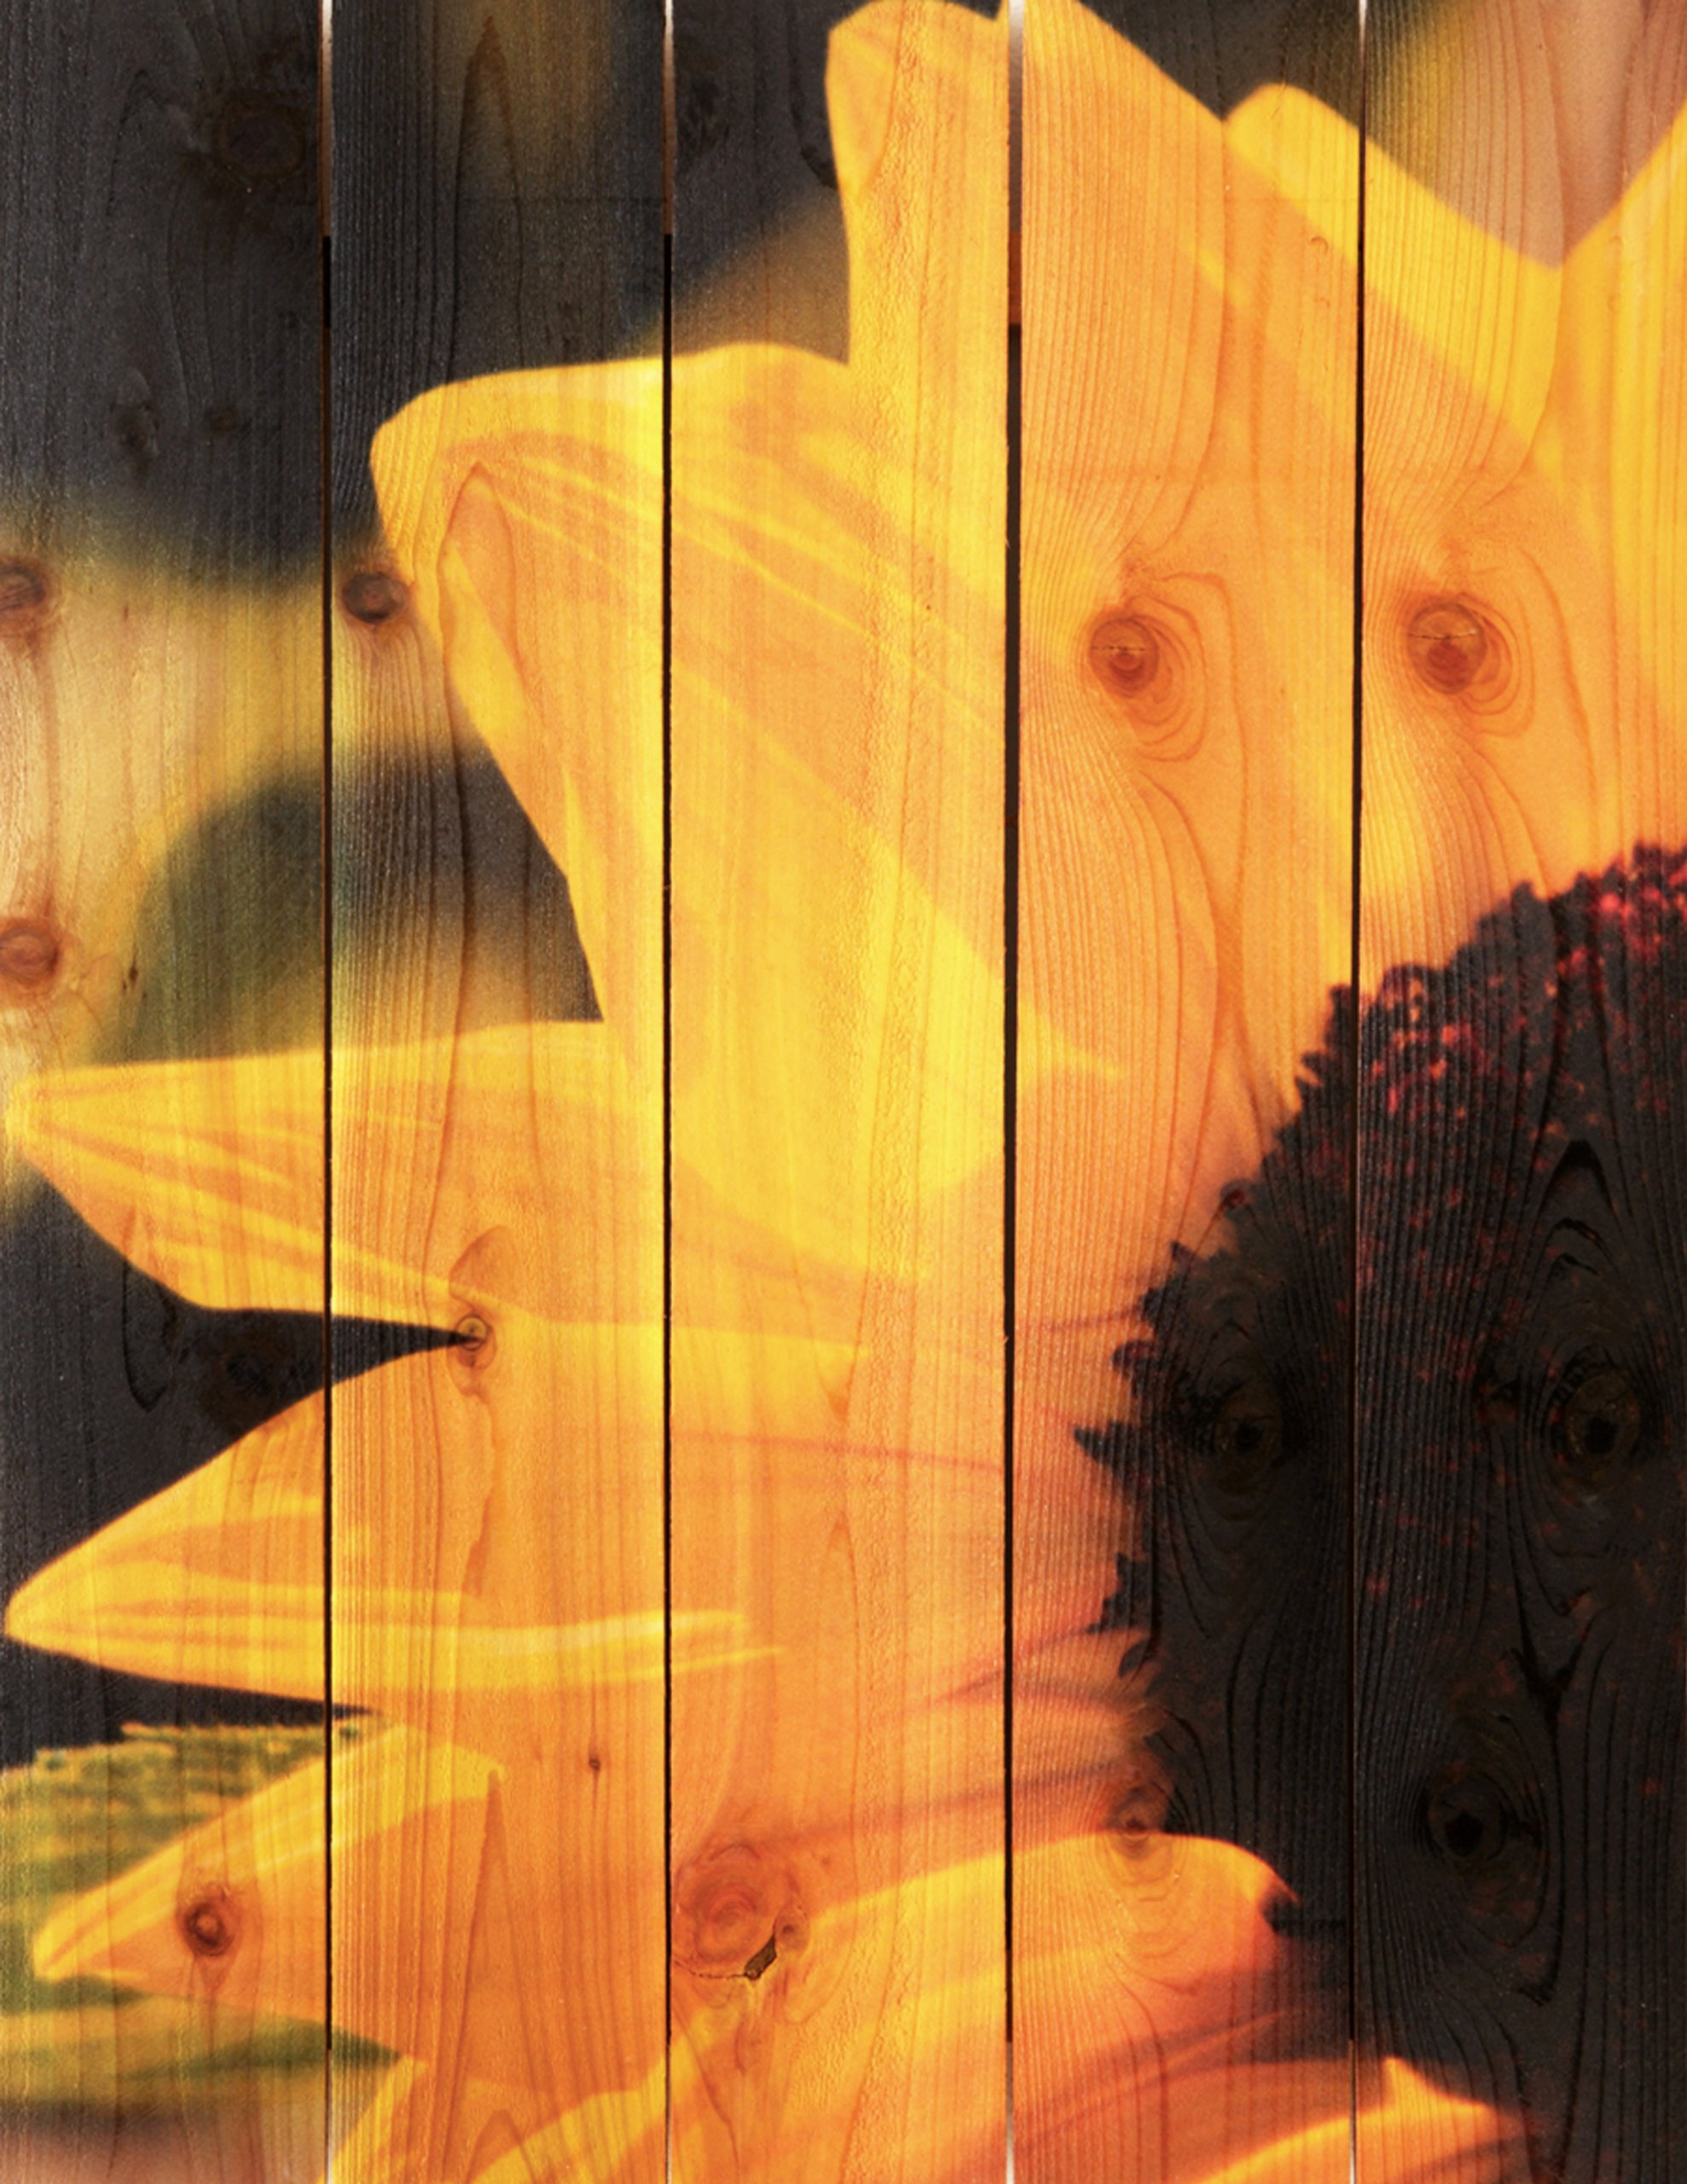 Gizaun Art Yellow Sunflower 28-Inch by 36-Inch Inside/Outside Wall ...